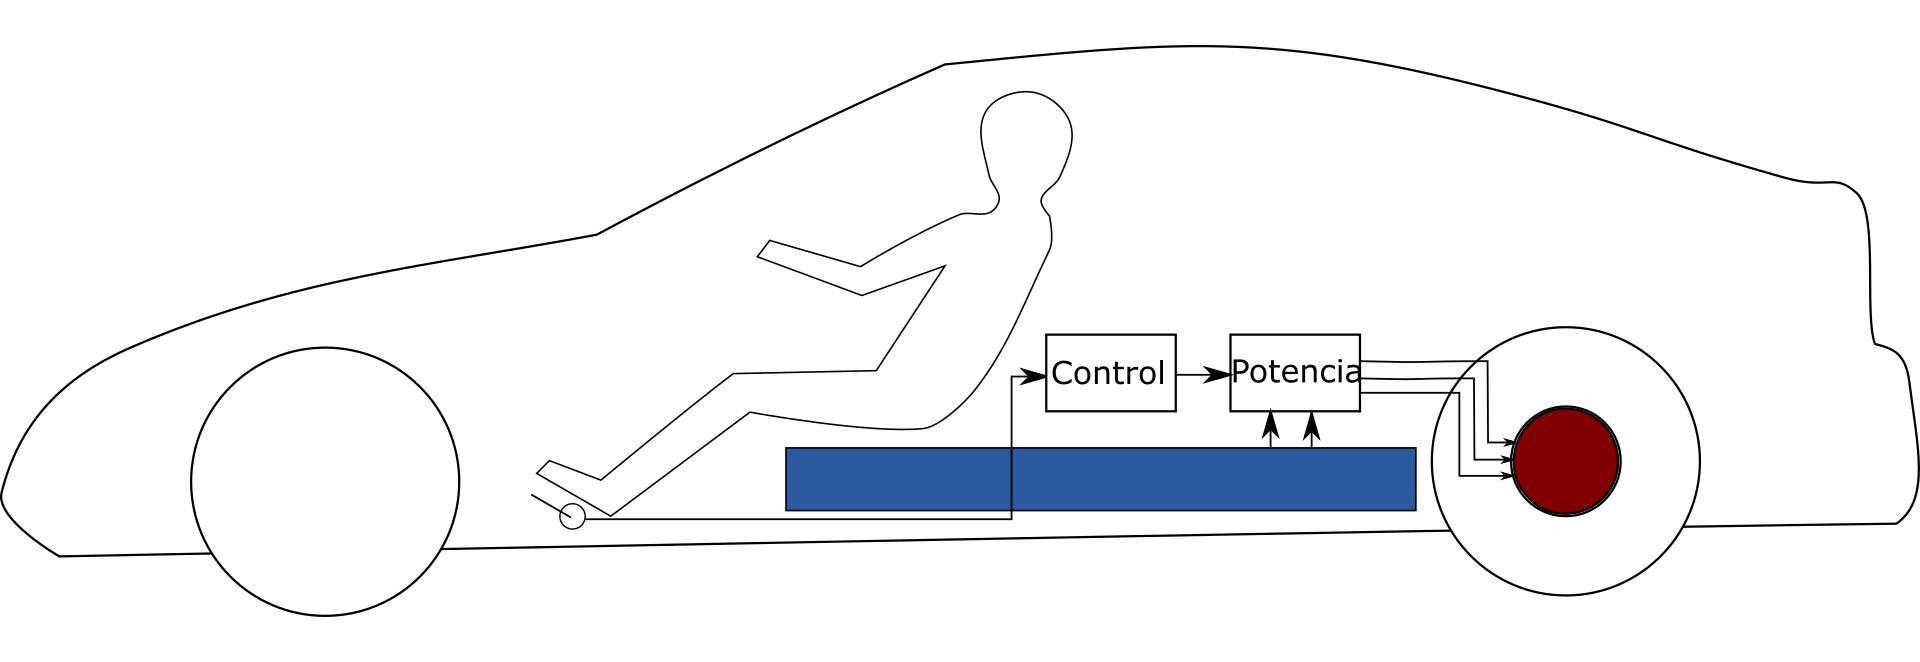 Control Segunda aproximación